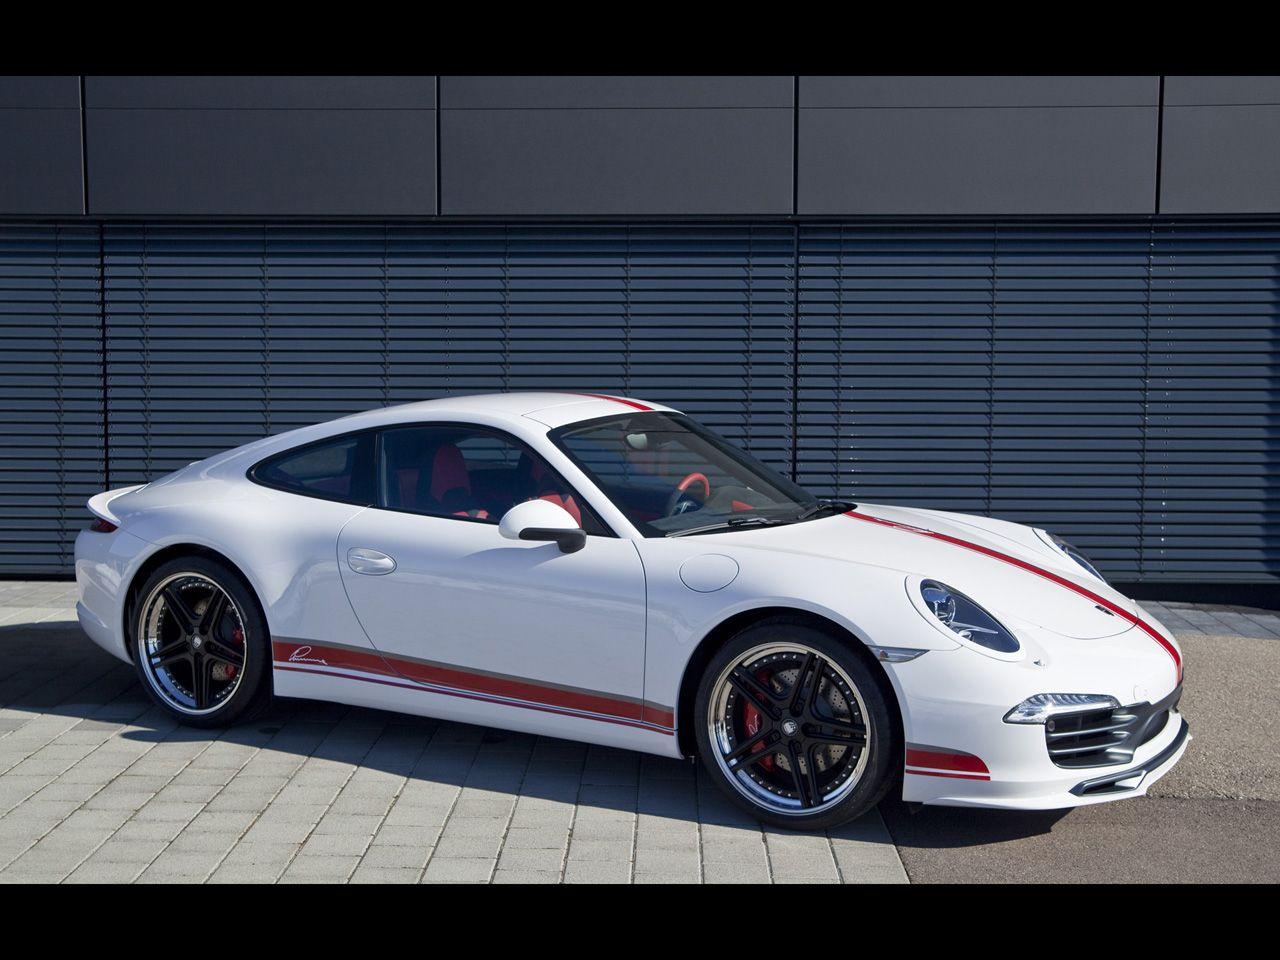 2012 Lumma Design Porsche Carrera 991 CLR 9 S